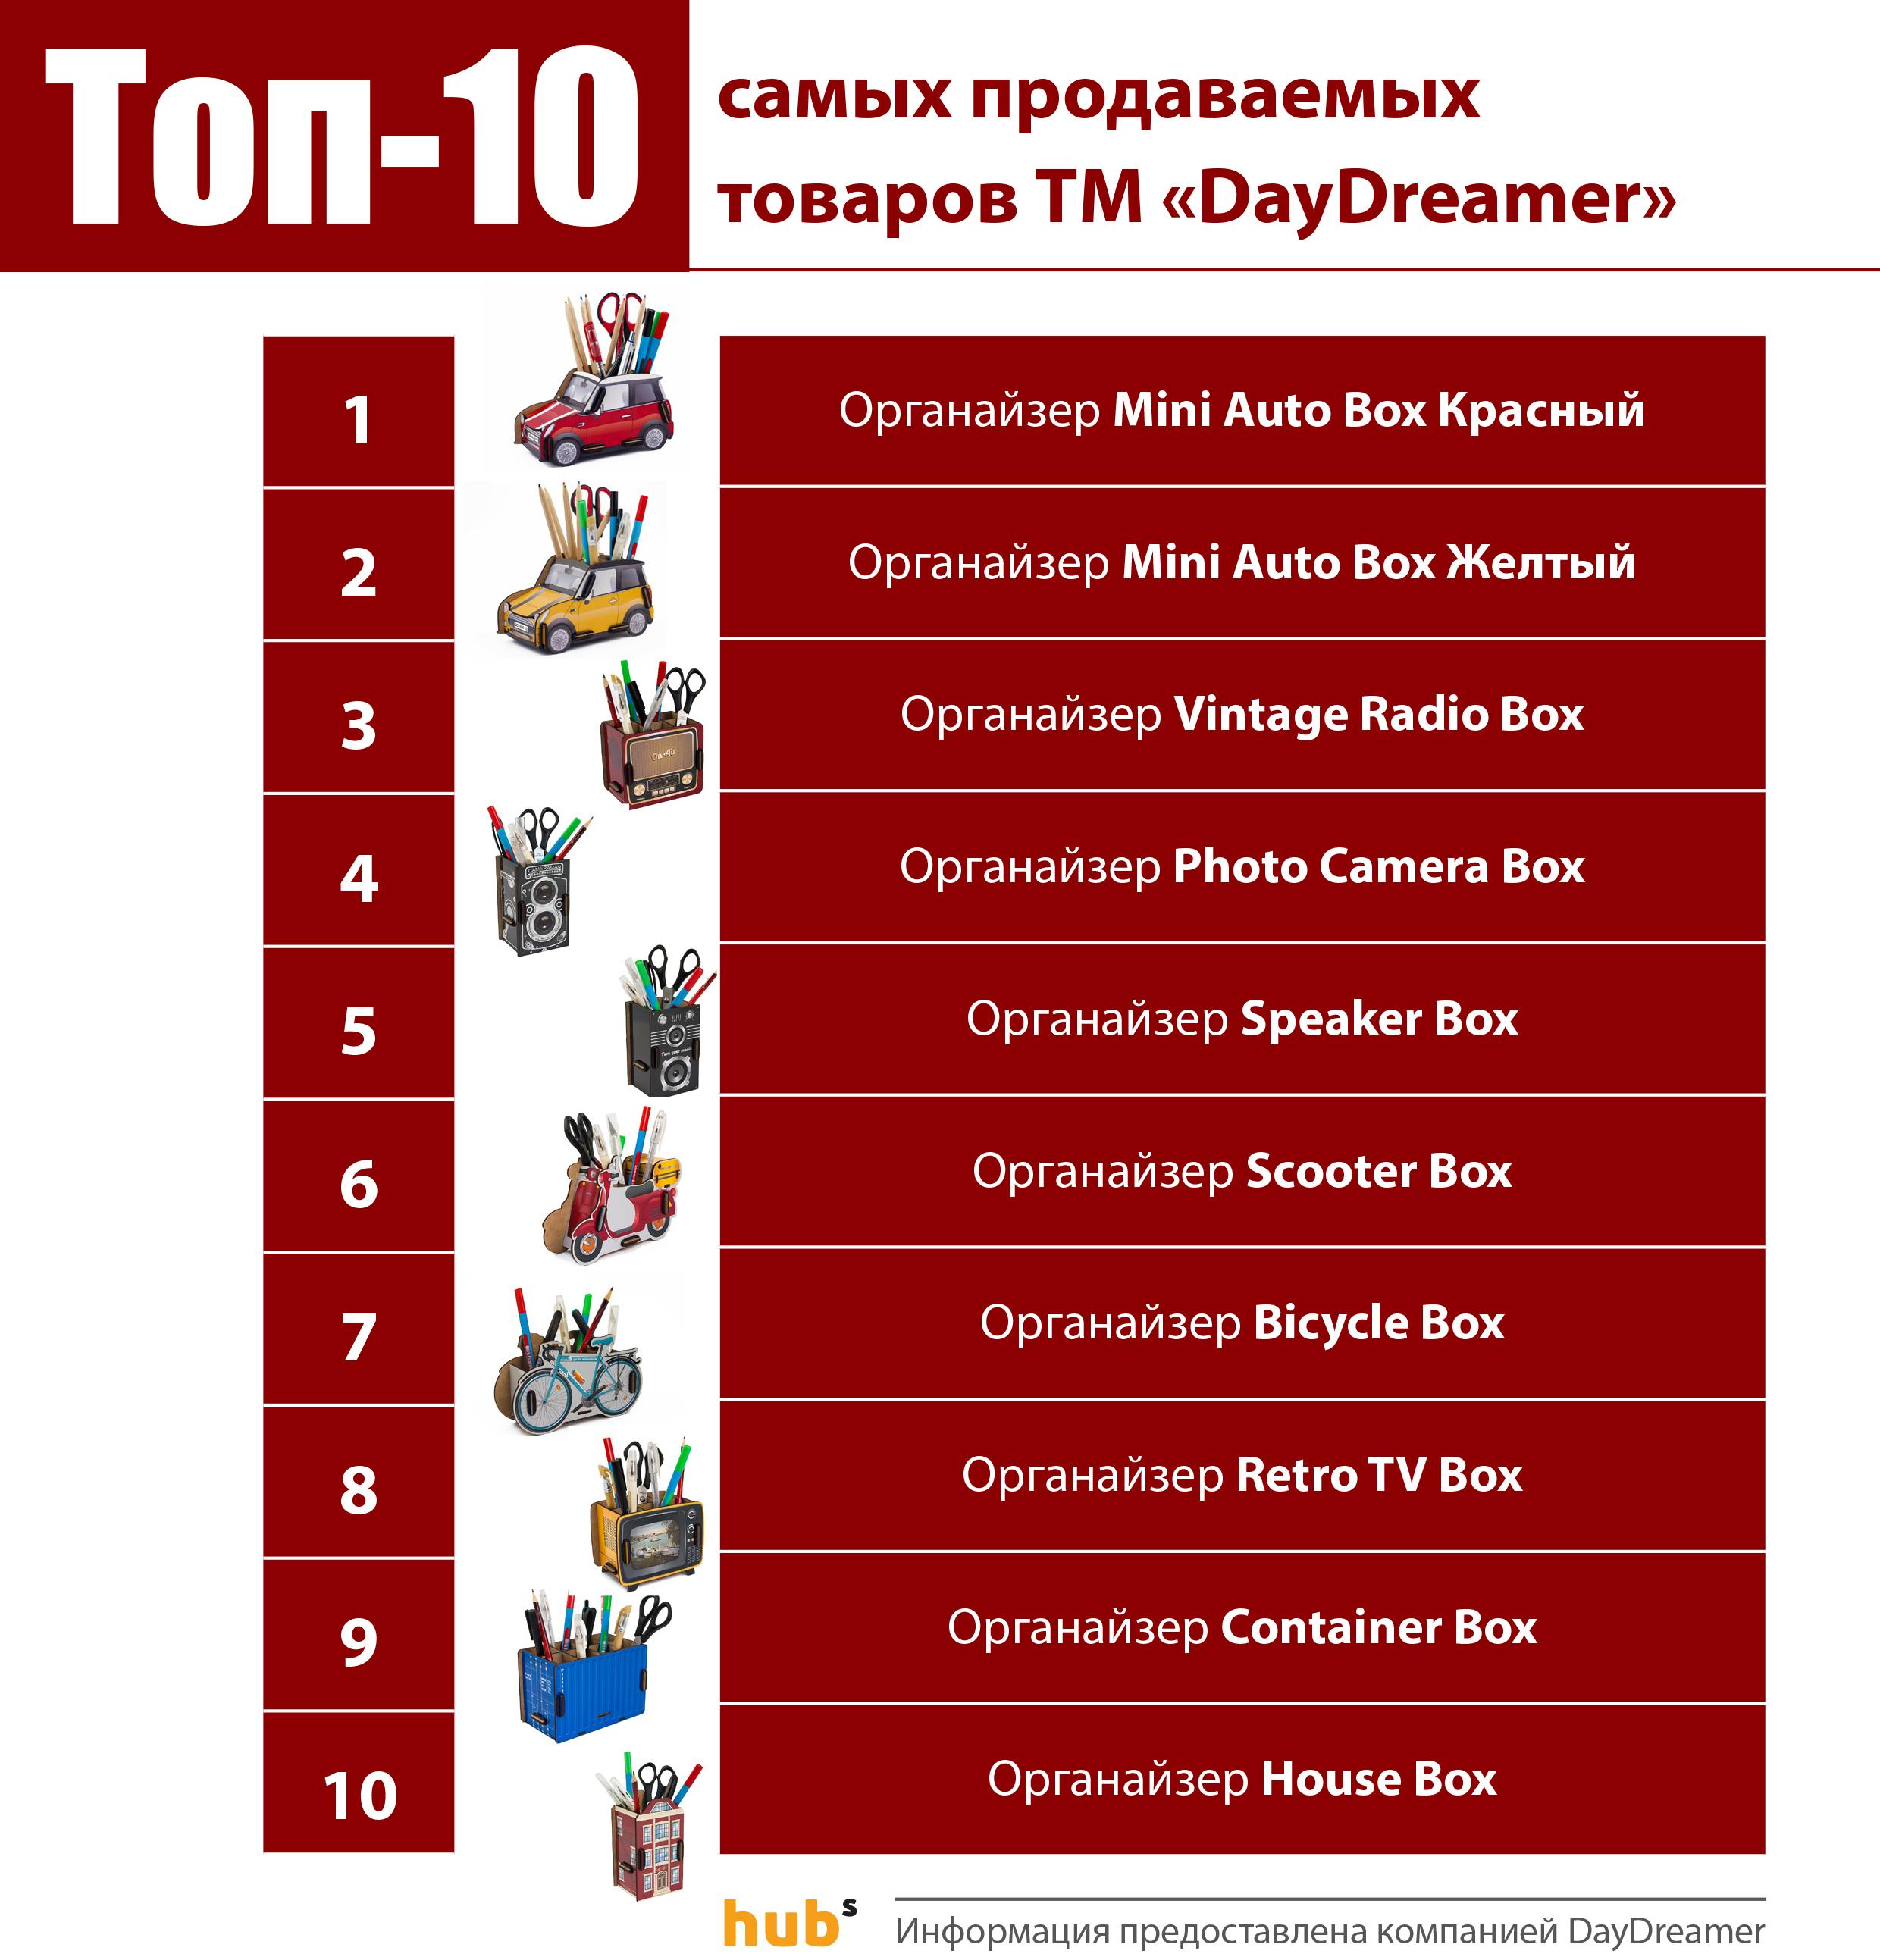 Unlimit Ukraine, Европейская Бизнес Ассоциация, продажи DayDreamer